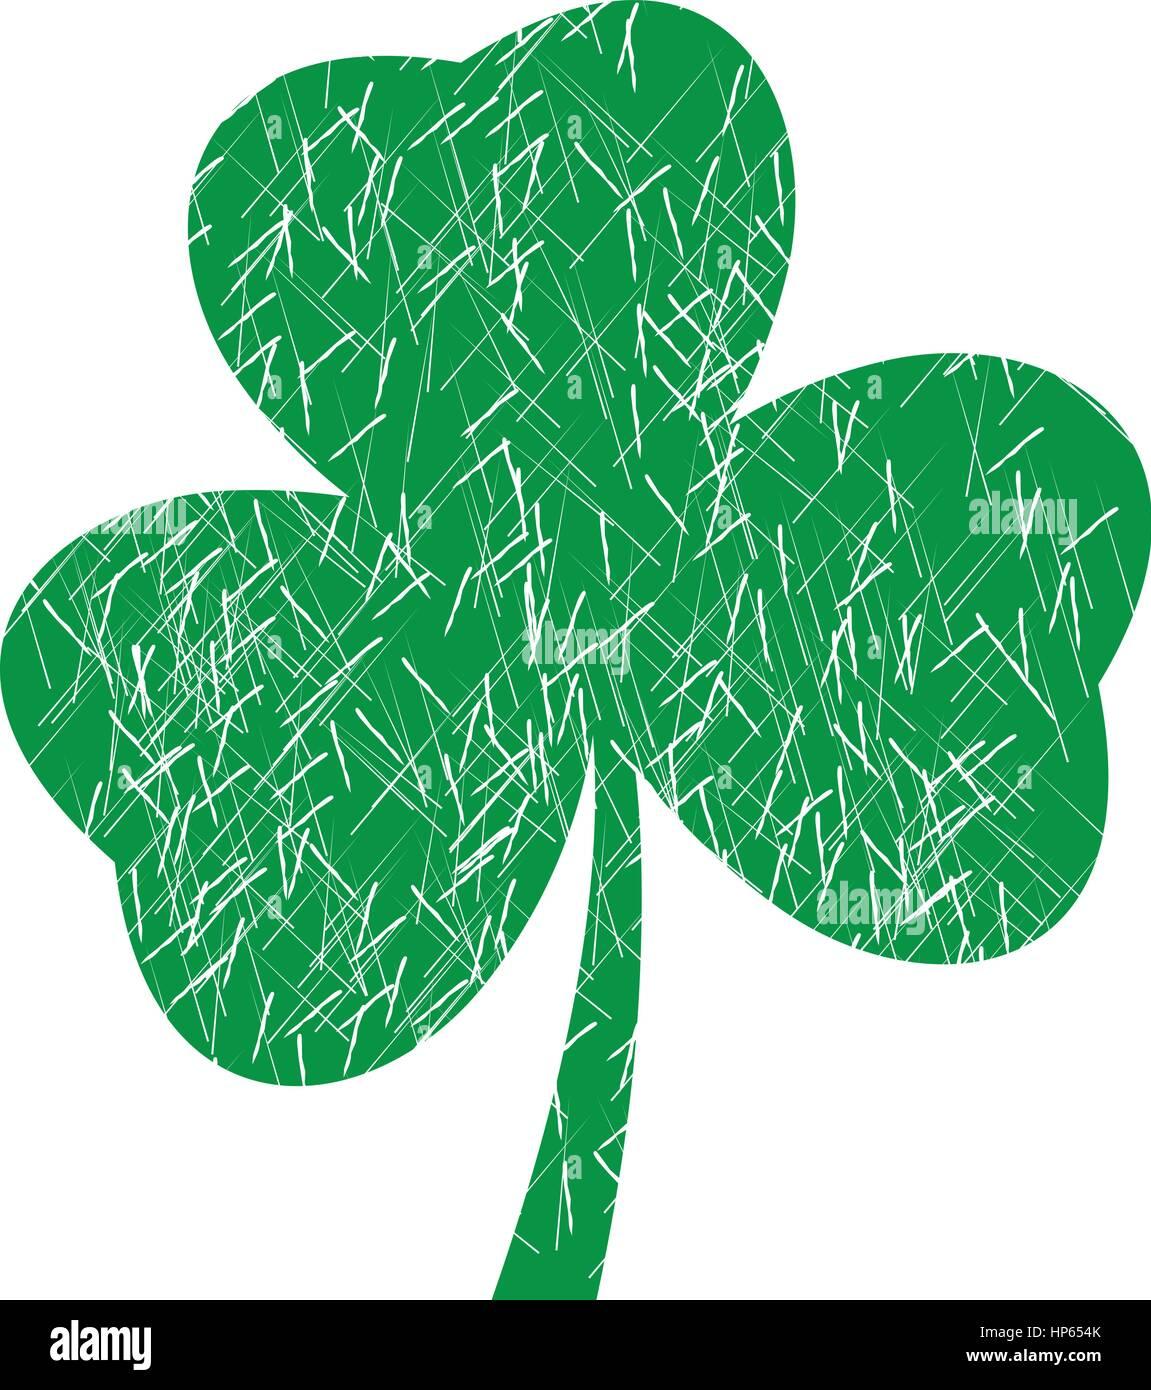 Vector illustration of a grunge shamrock for st patrick day irish vector illustration of a grunge shamrock for st patrick day irish symbol biocorpaavc Gallery